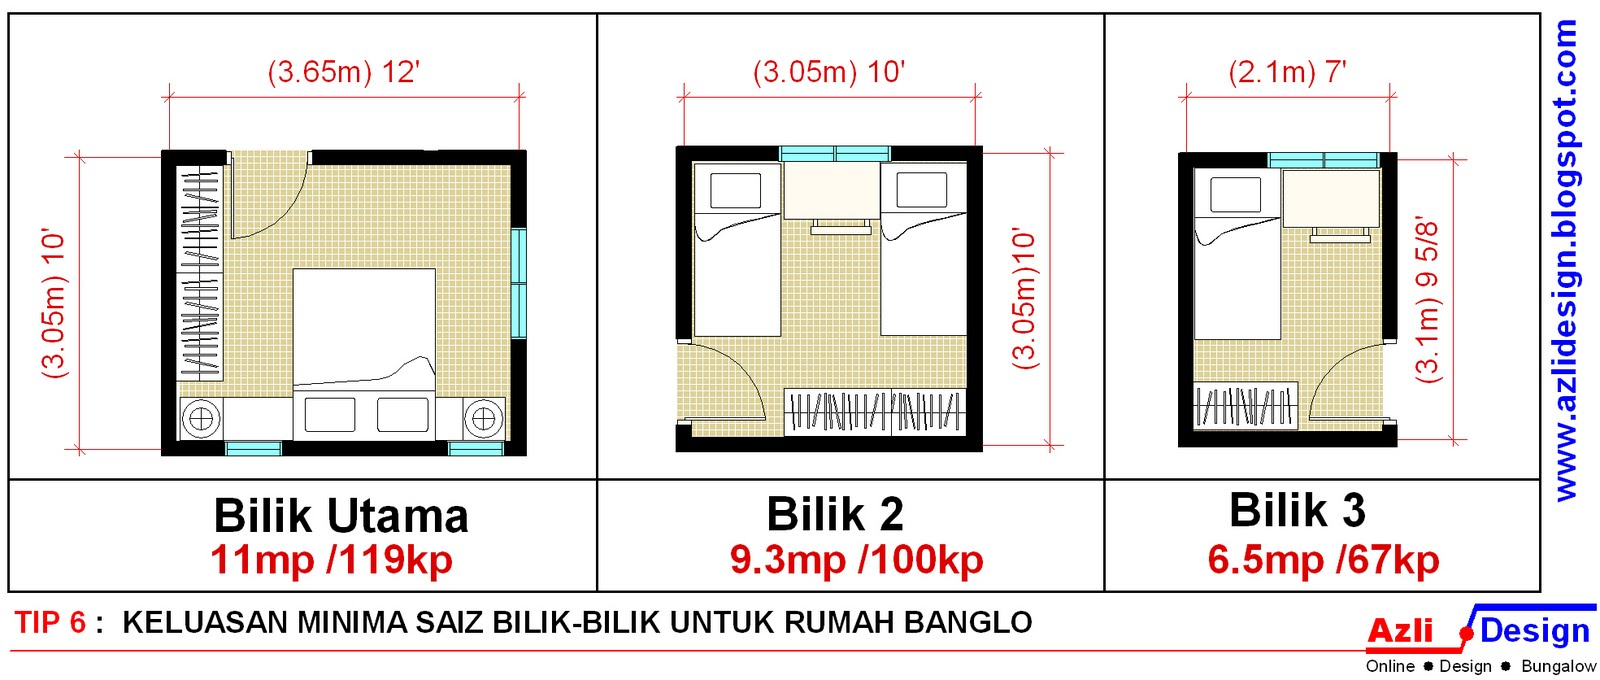 idea rumah idaman anda idea design bungalow pelan banglo masih